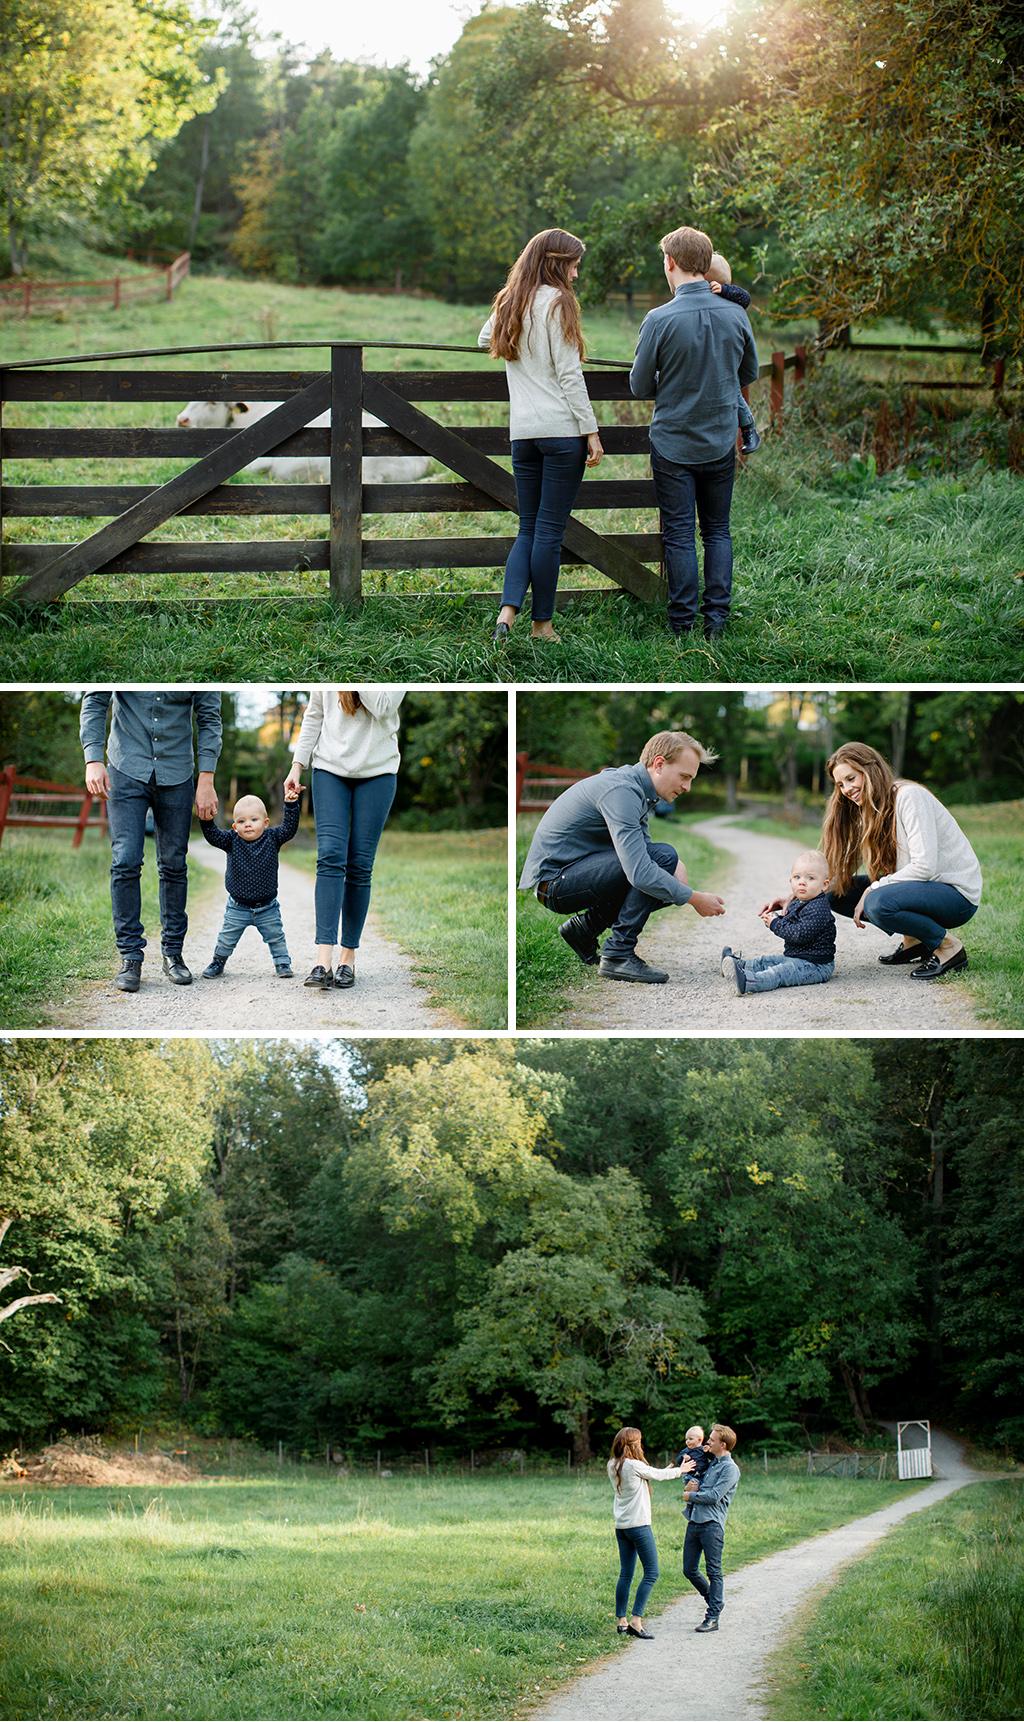 Familjefotografering_Stockholm_Familjefotograf-Anna-Sandstrom_3.jpg